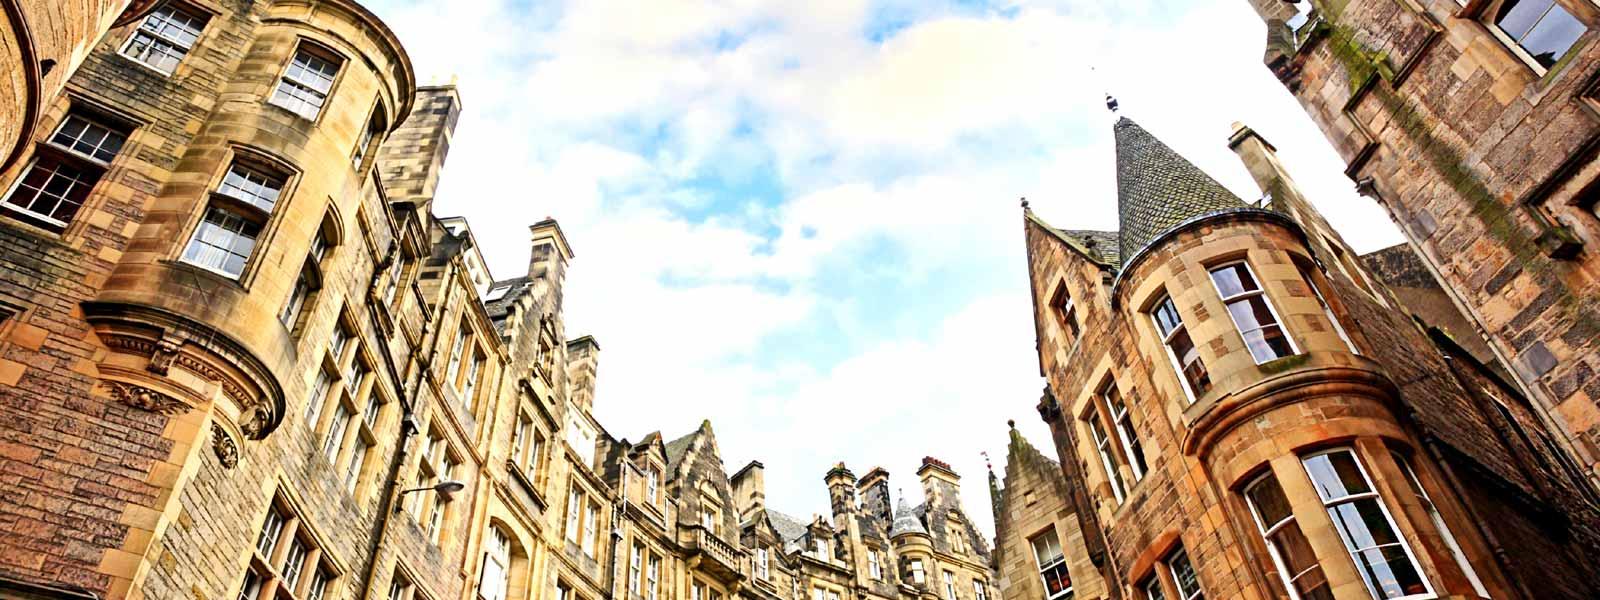 Historic buildings in Edinburgh